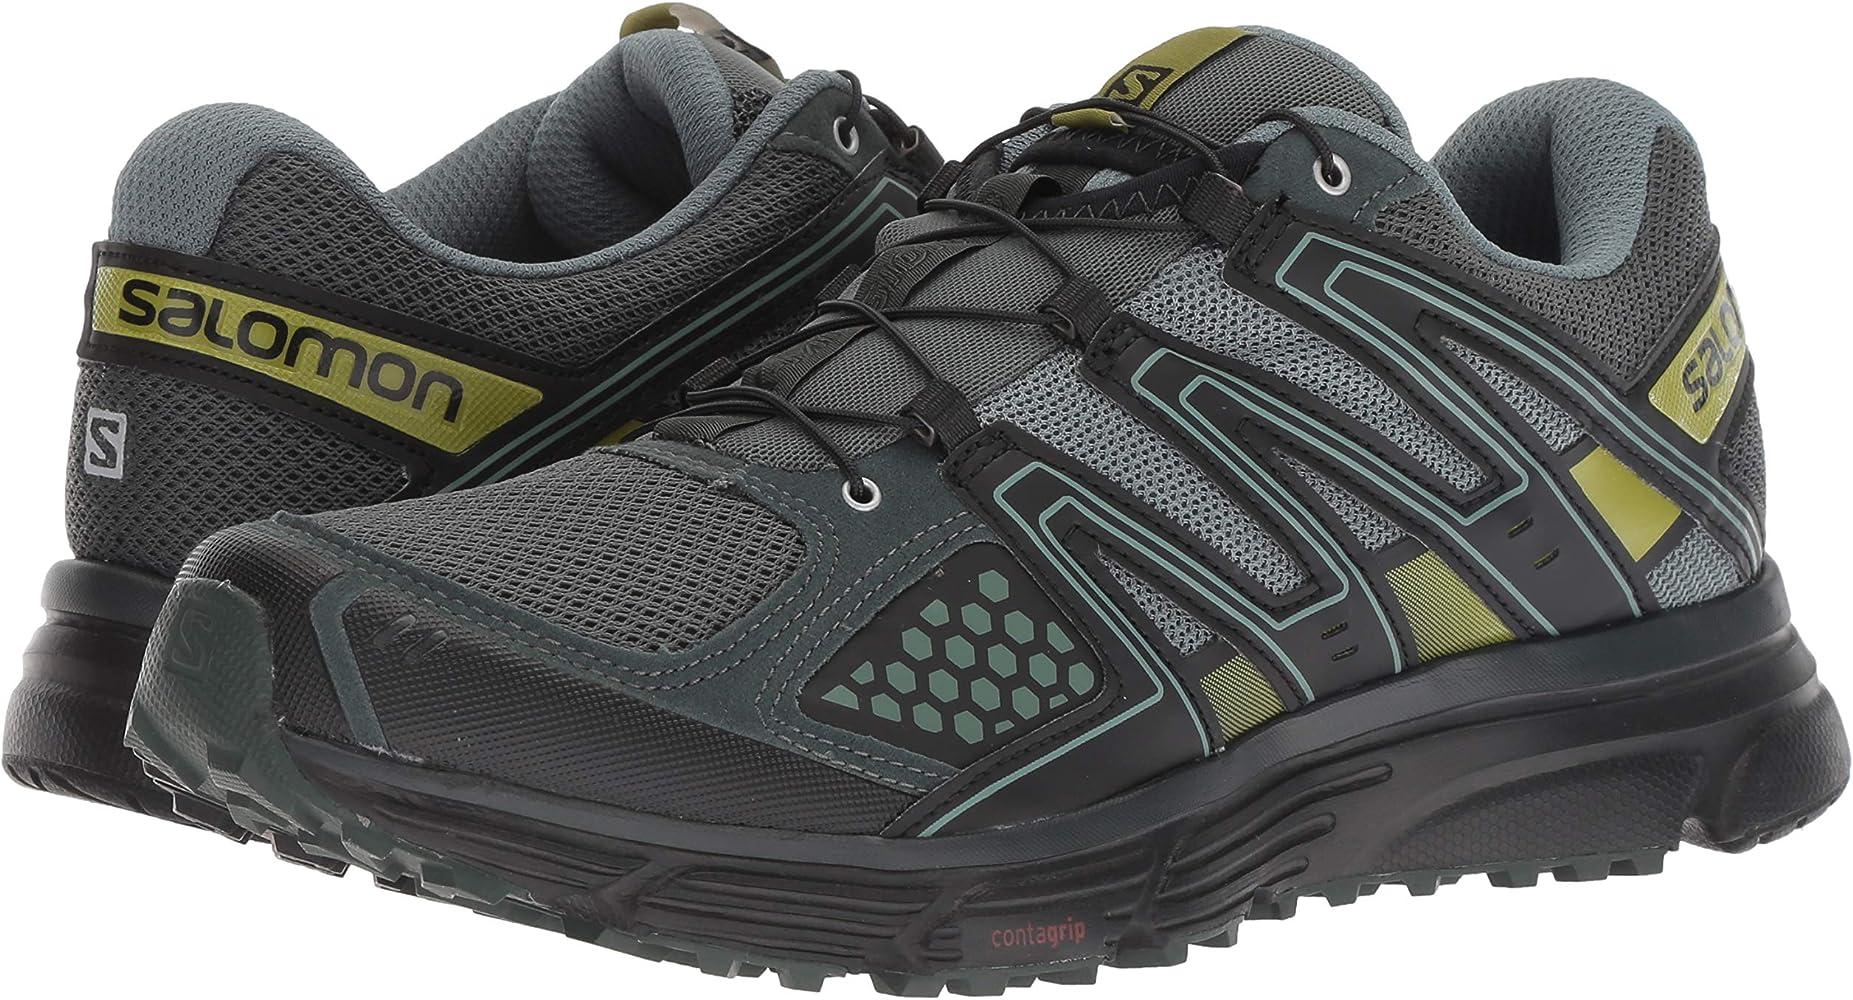 Salomon Homme Chaussures de Trail Running, X MISSION 3, Gris